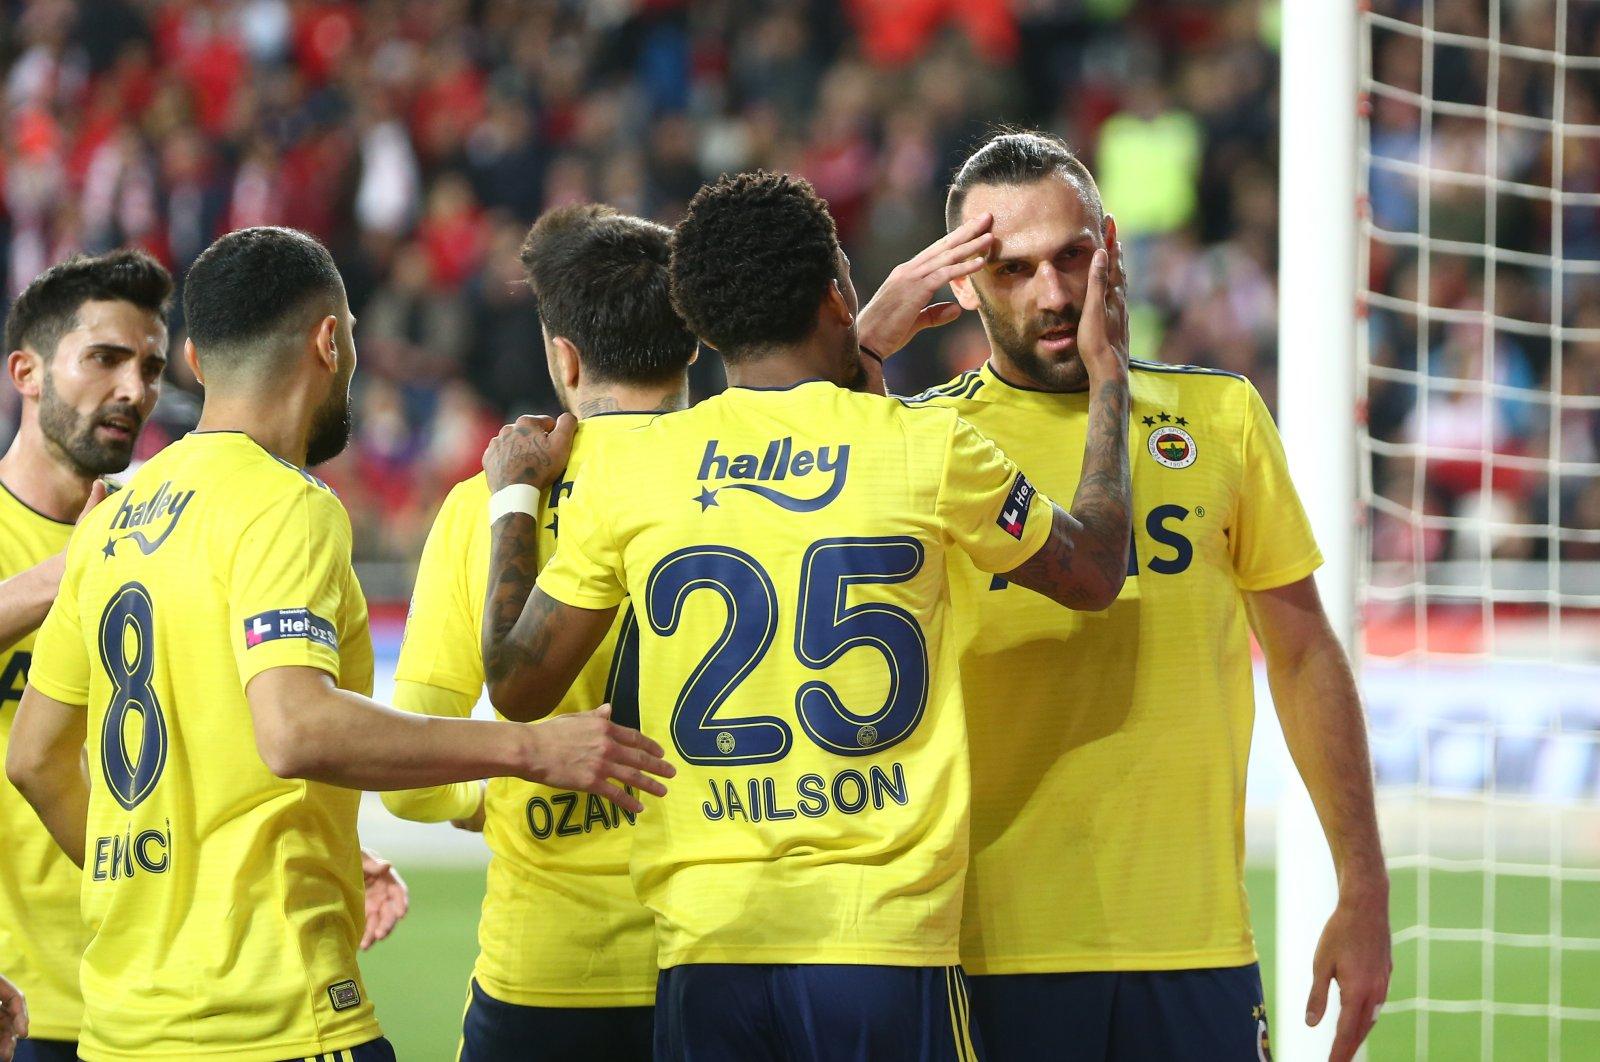 Fenerbahçe players celebrate a goal against Antalyaspor during a Süper Lig match in Antalya, Turkey, Feb. 29, 2020. (AA Photo)